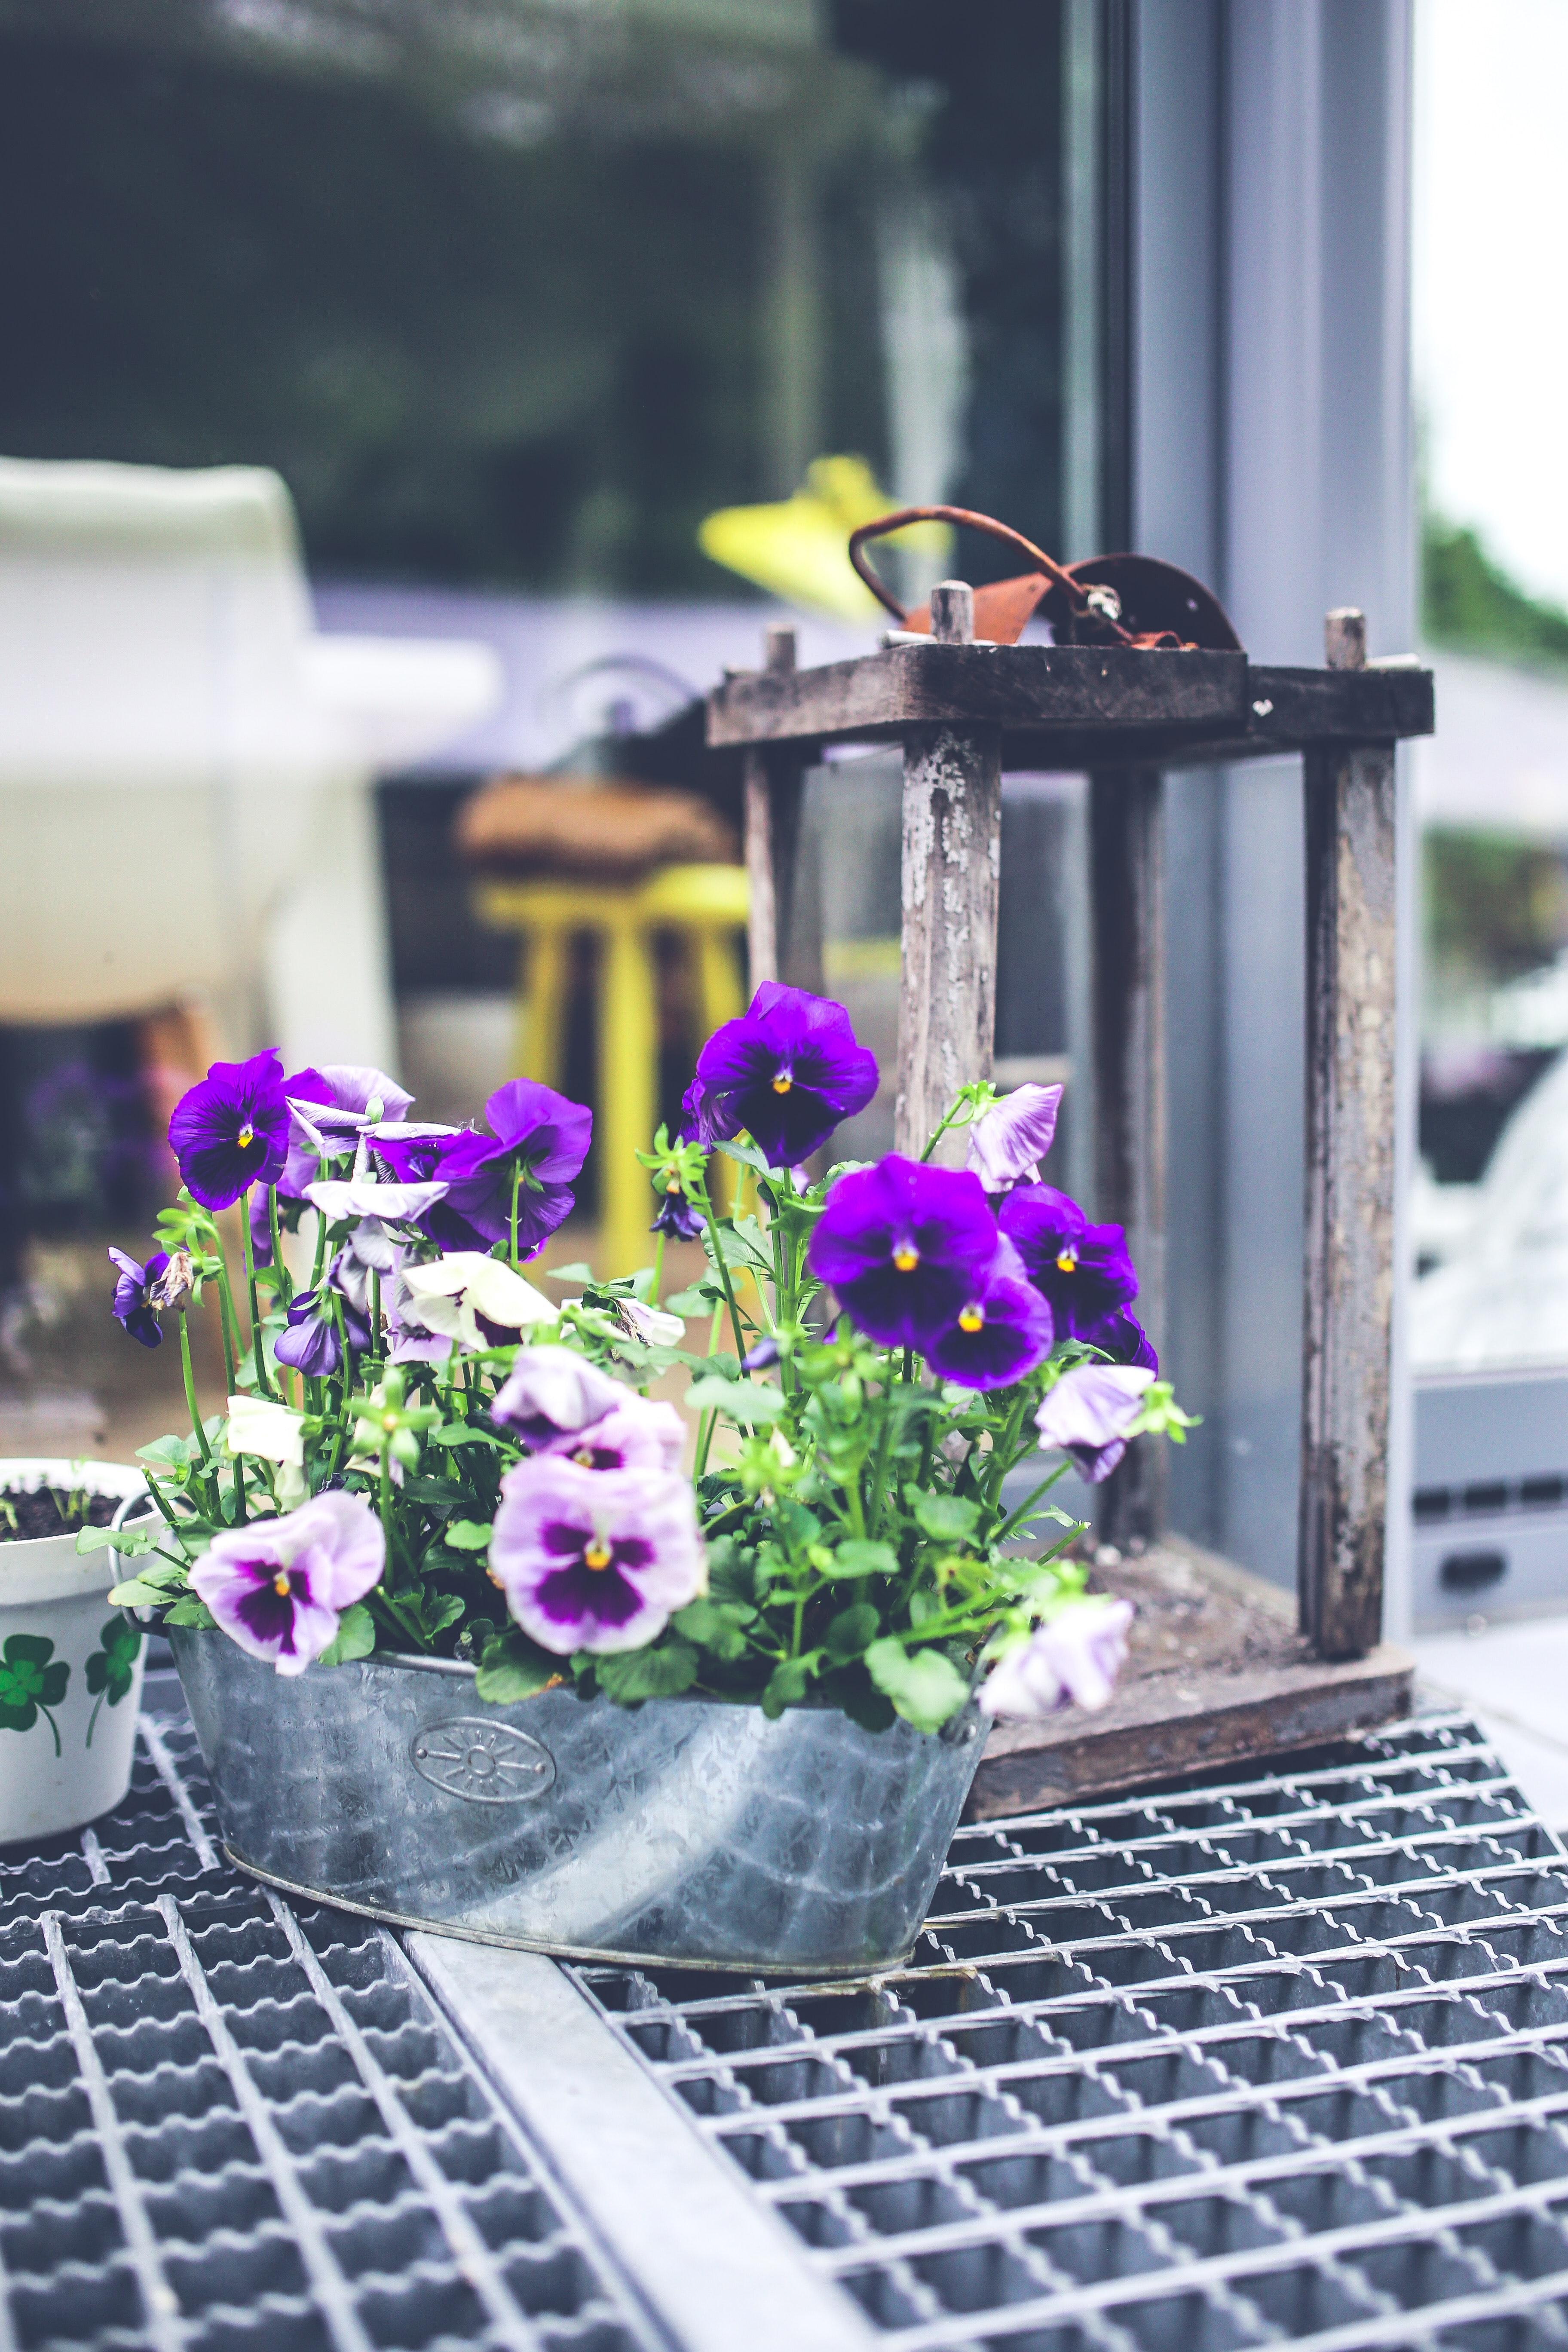 Old lantern & pansies, Backyard, Outdoors, Vintage, Vacation, HQ Photo